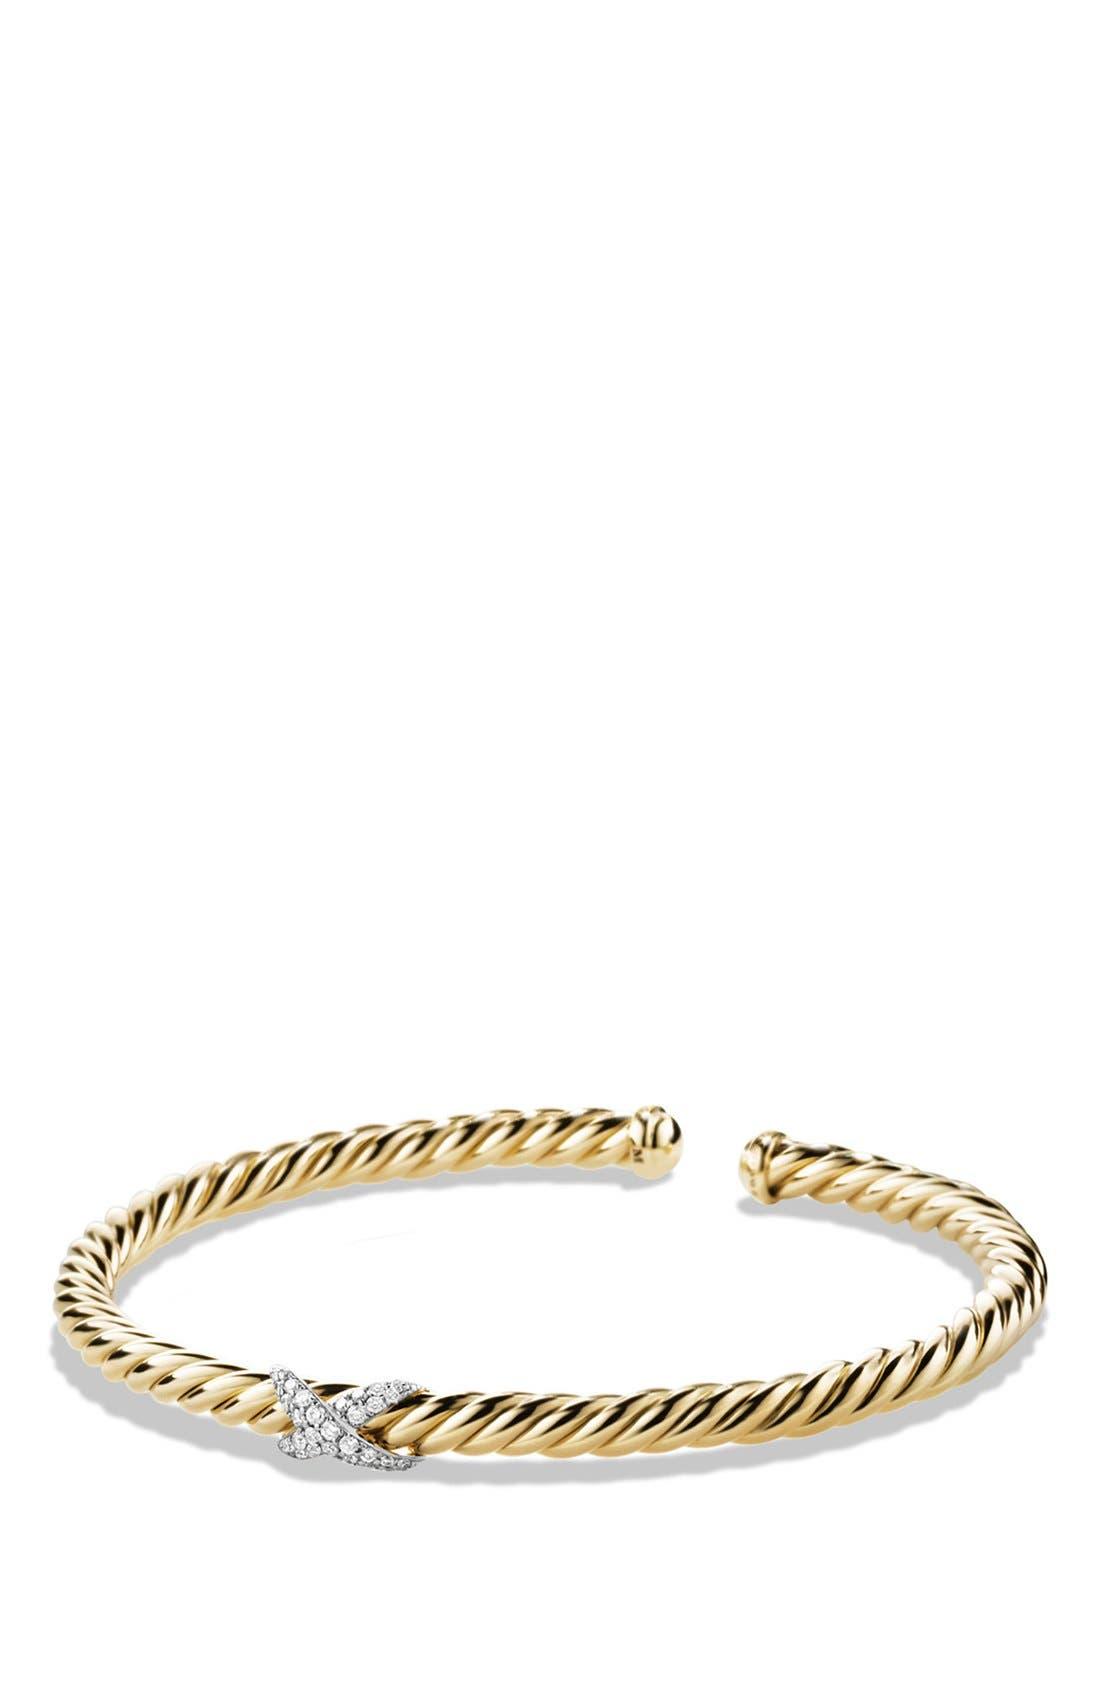 'X - Cablespira' Bracelet with Diamonds in 18k Gold, Main, color, DIAMOND